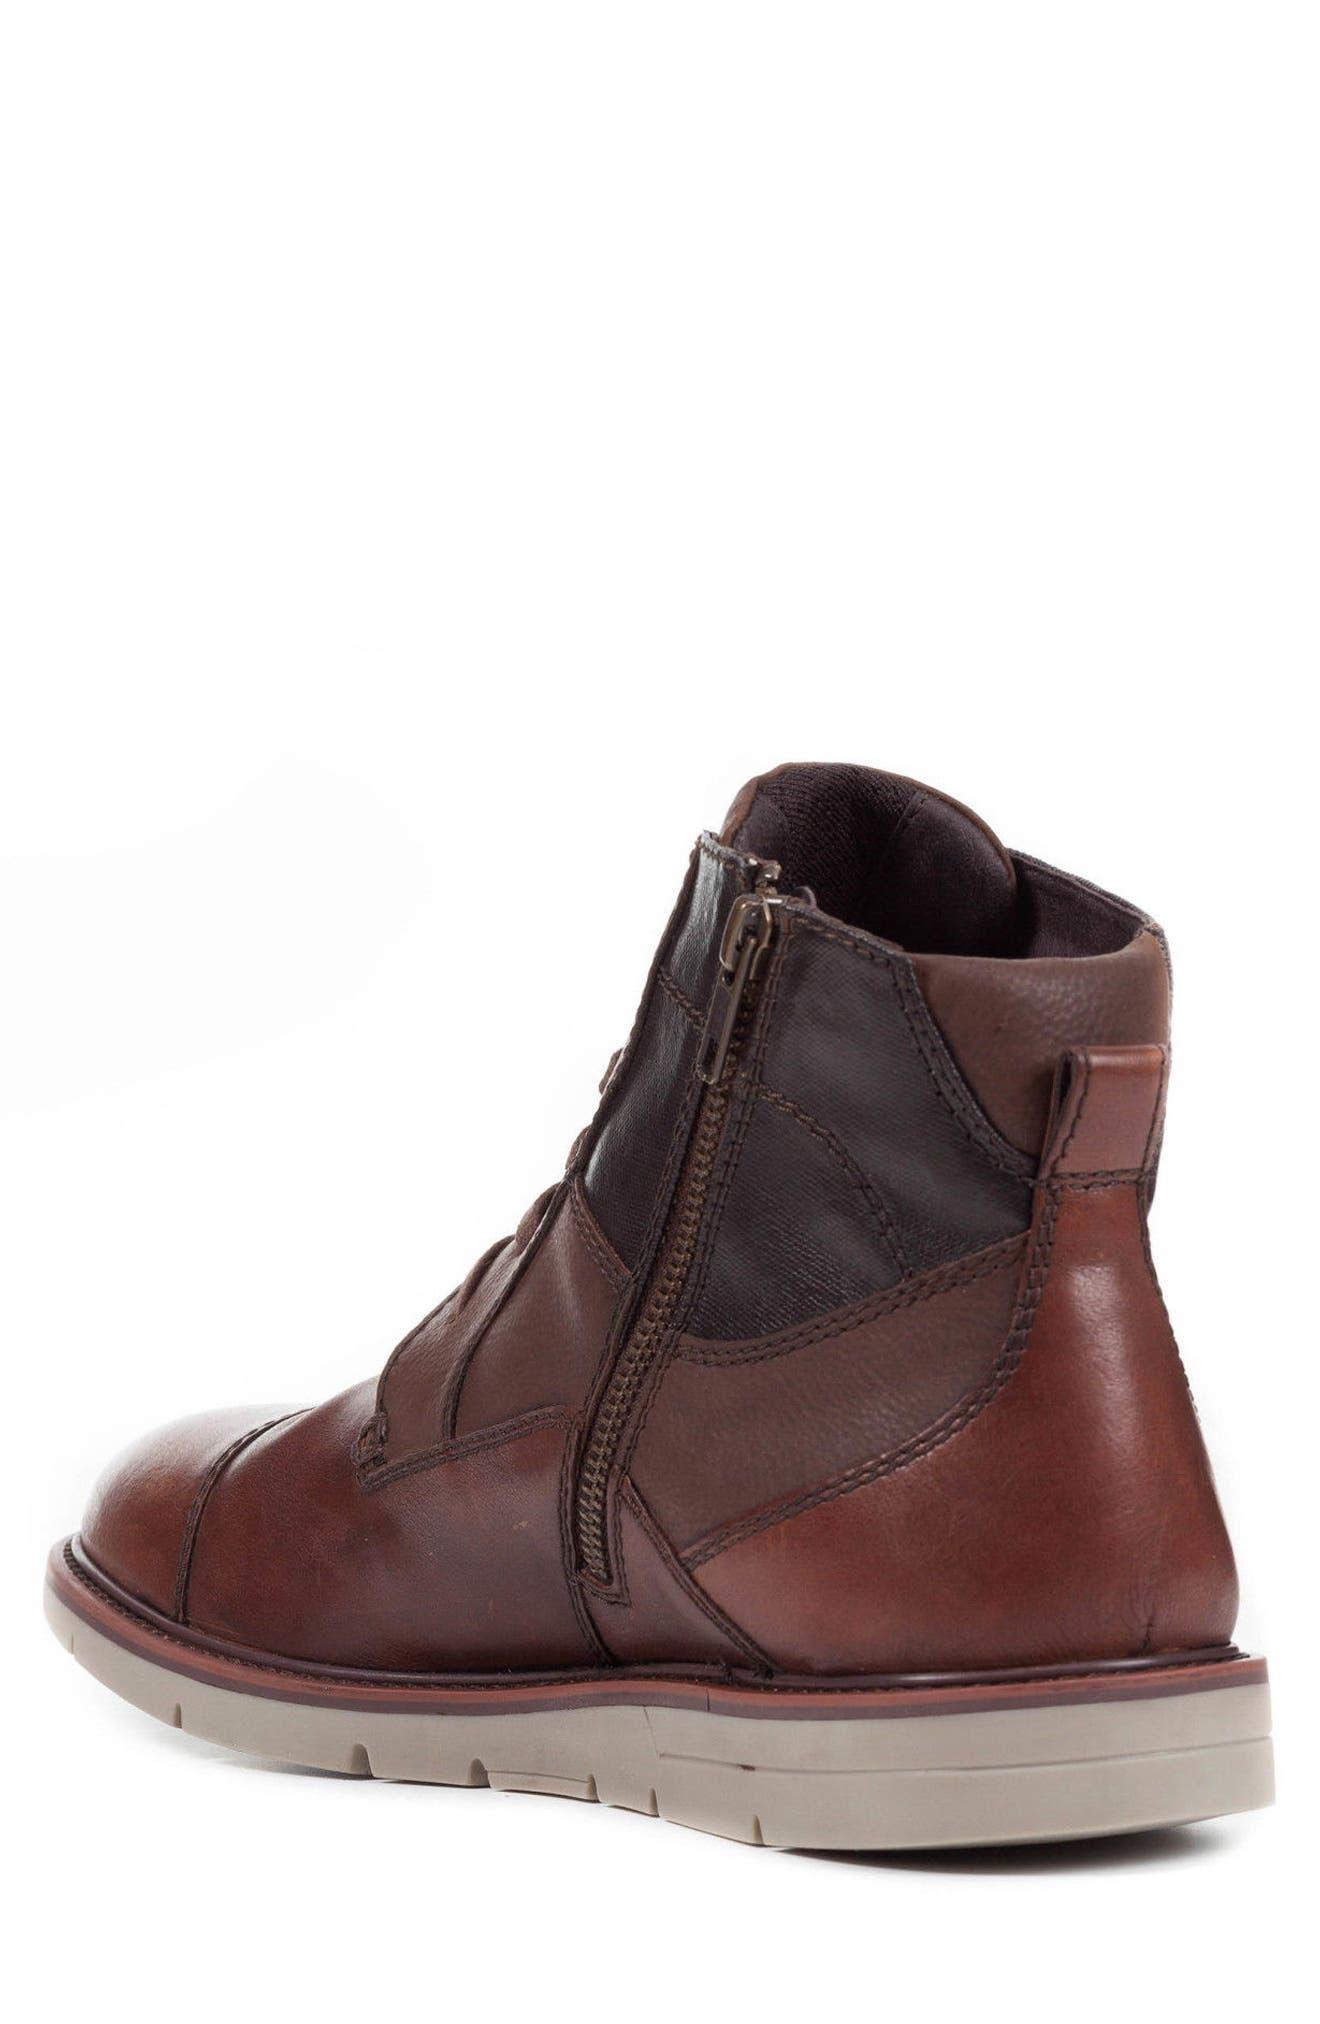 Muvet 5 Cap Toe Boot,                             Alternate thumbnail 4, color,